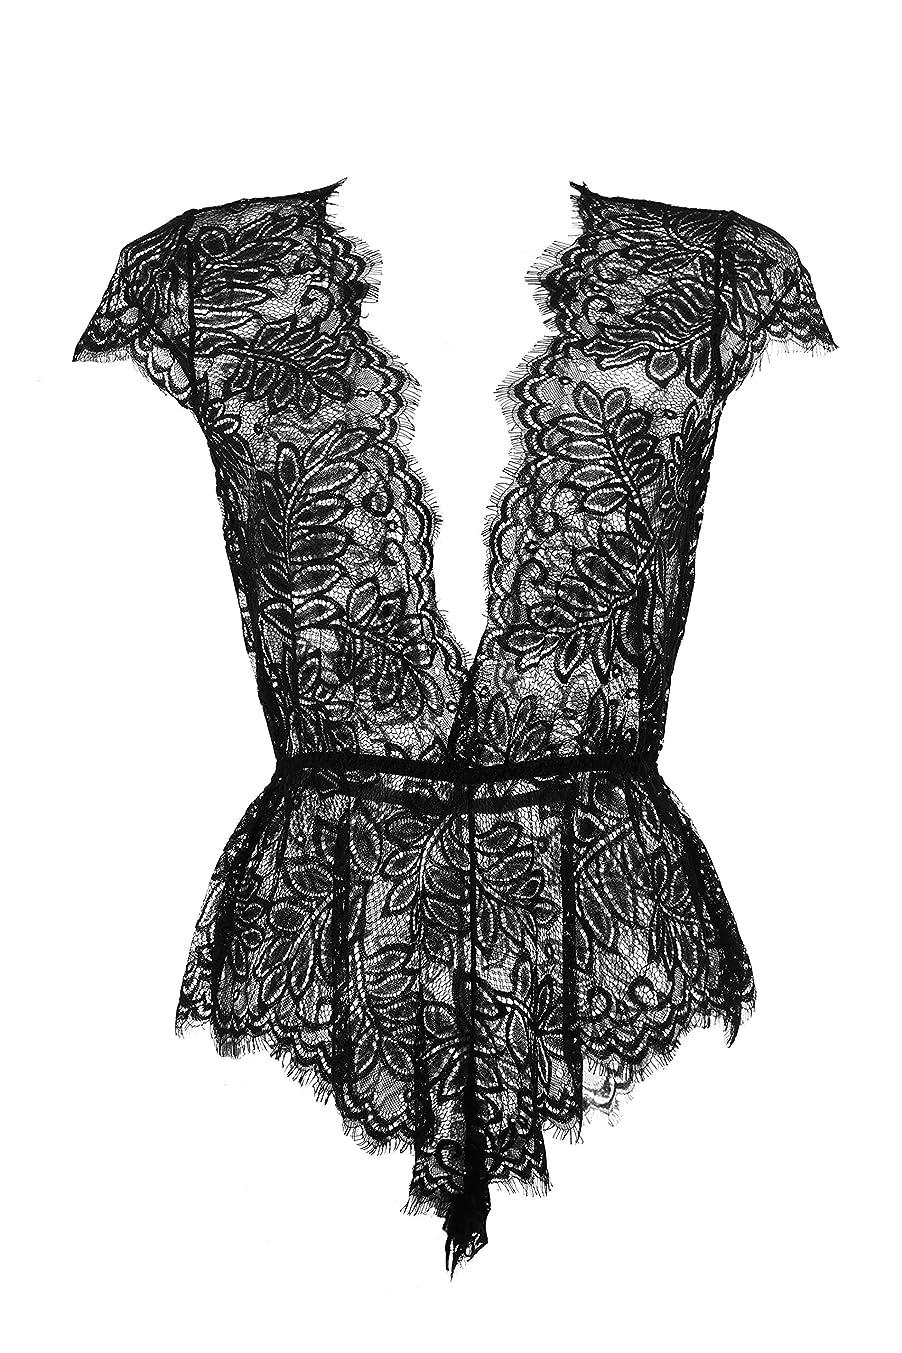 YosbuTi Women's Chemises & Negligees Lingerie V Neck Lace Babydoll Bodysuit S-XXL